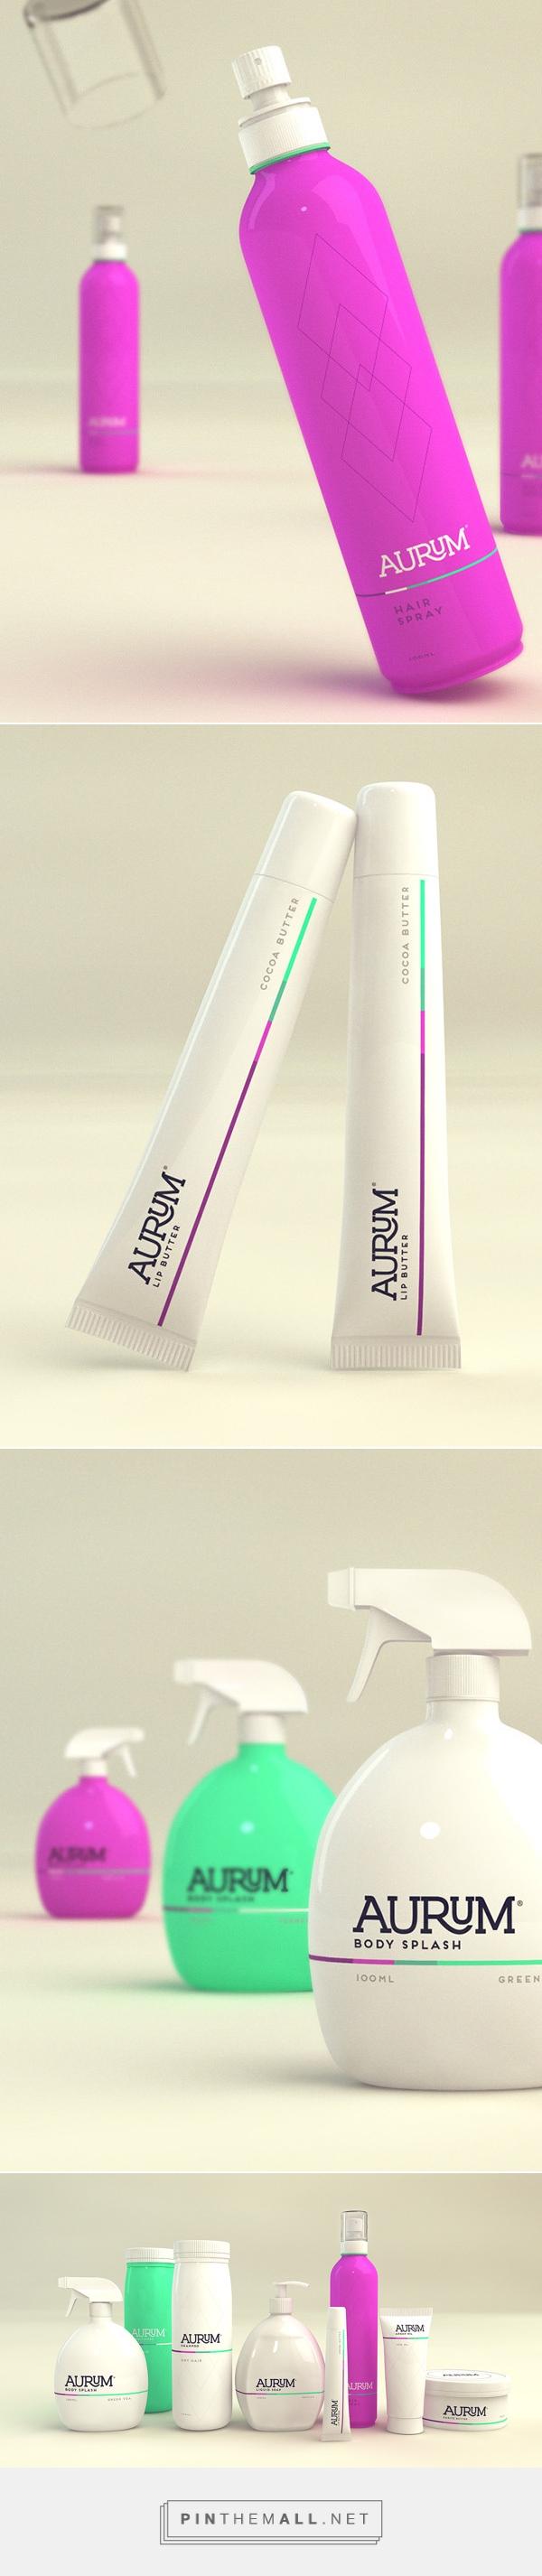 Aurum® / Aurum is a brand of natural cosmetics focused on organic products.